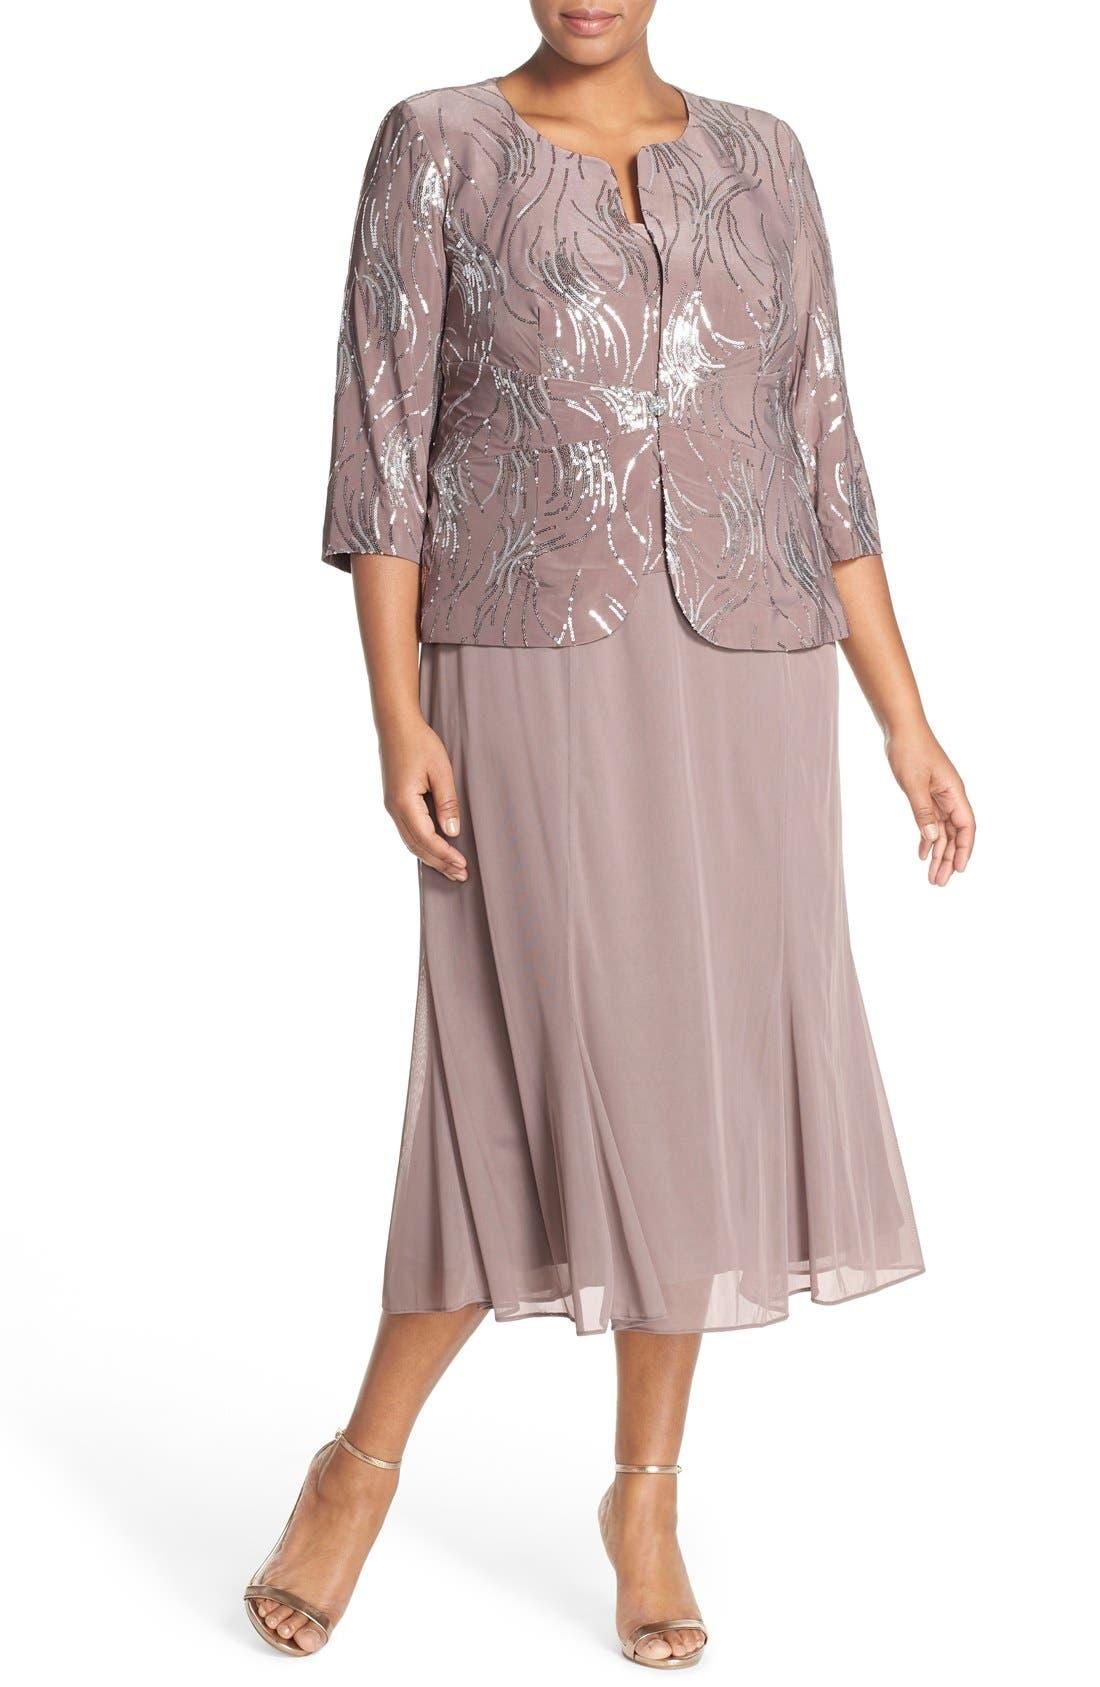 Plus Size Alex Evenings Sequin Mock Two-Piece Dress With Jacket, Metallic